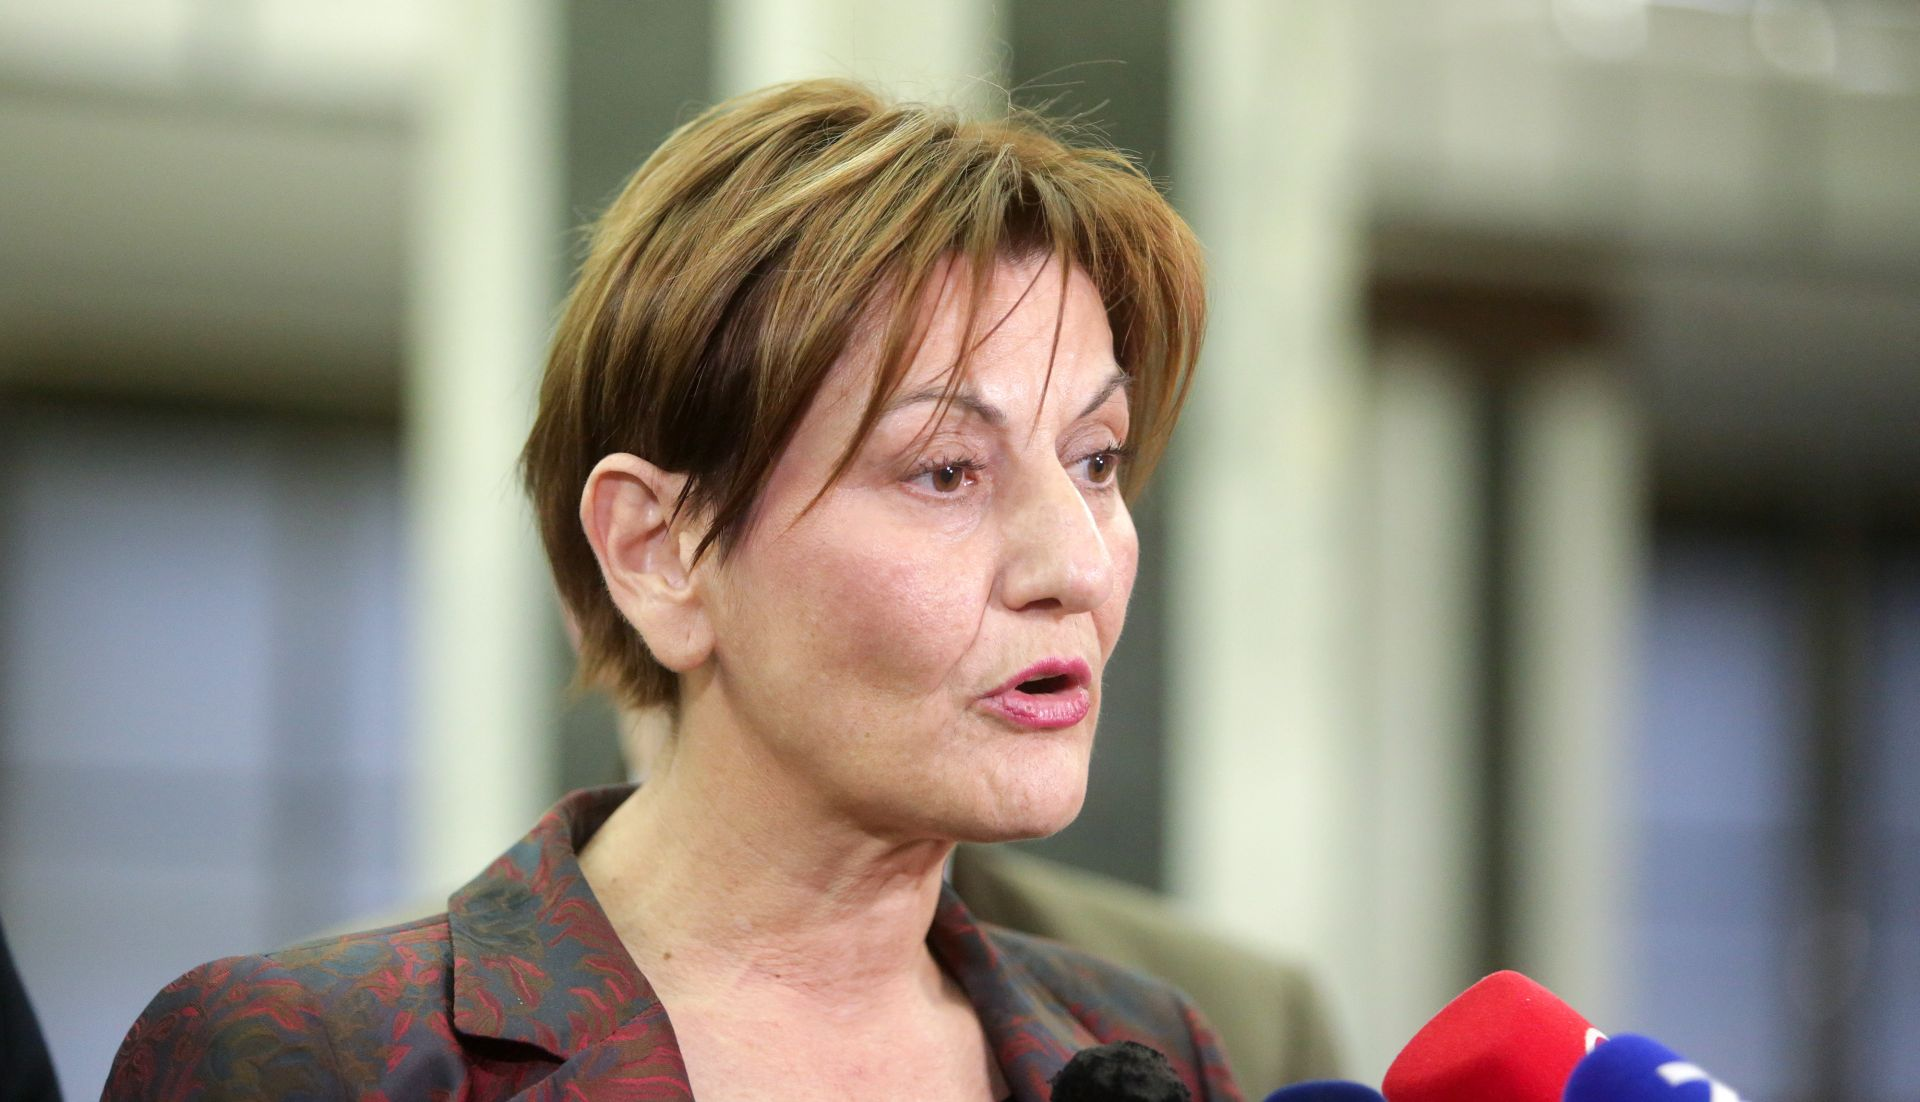 NOĆNI SASTANAK U VLADI 'Plenković i Dalić pripremaju Lex Todorić'